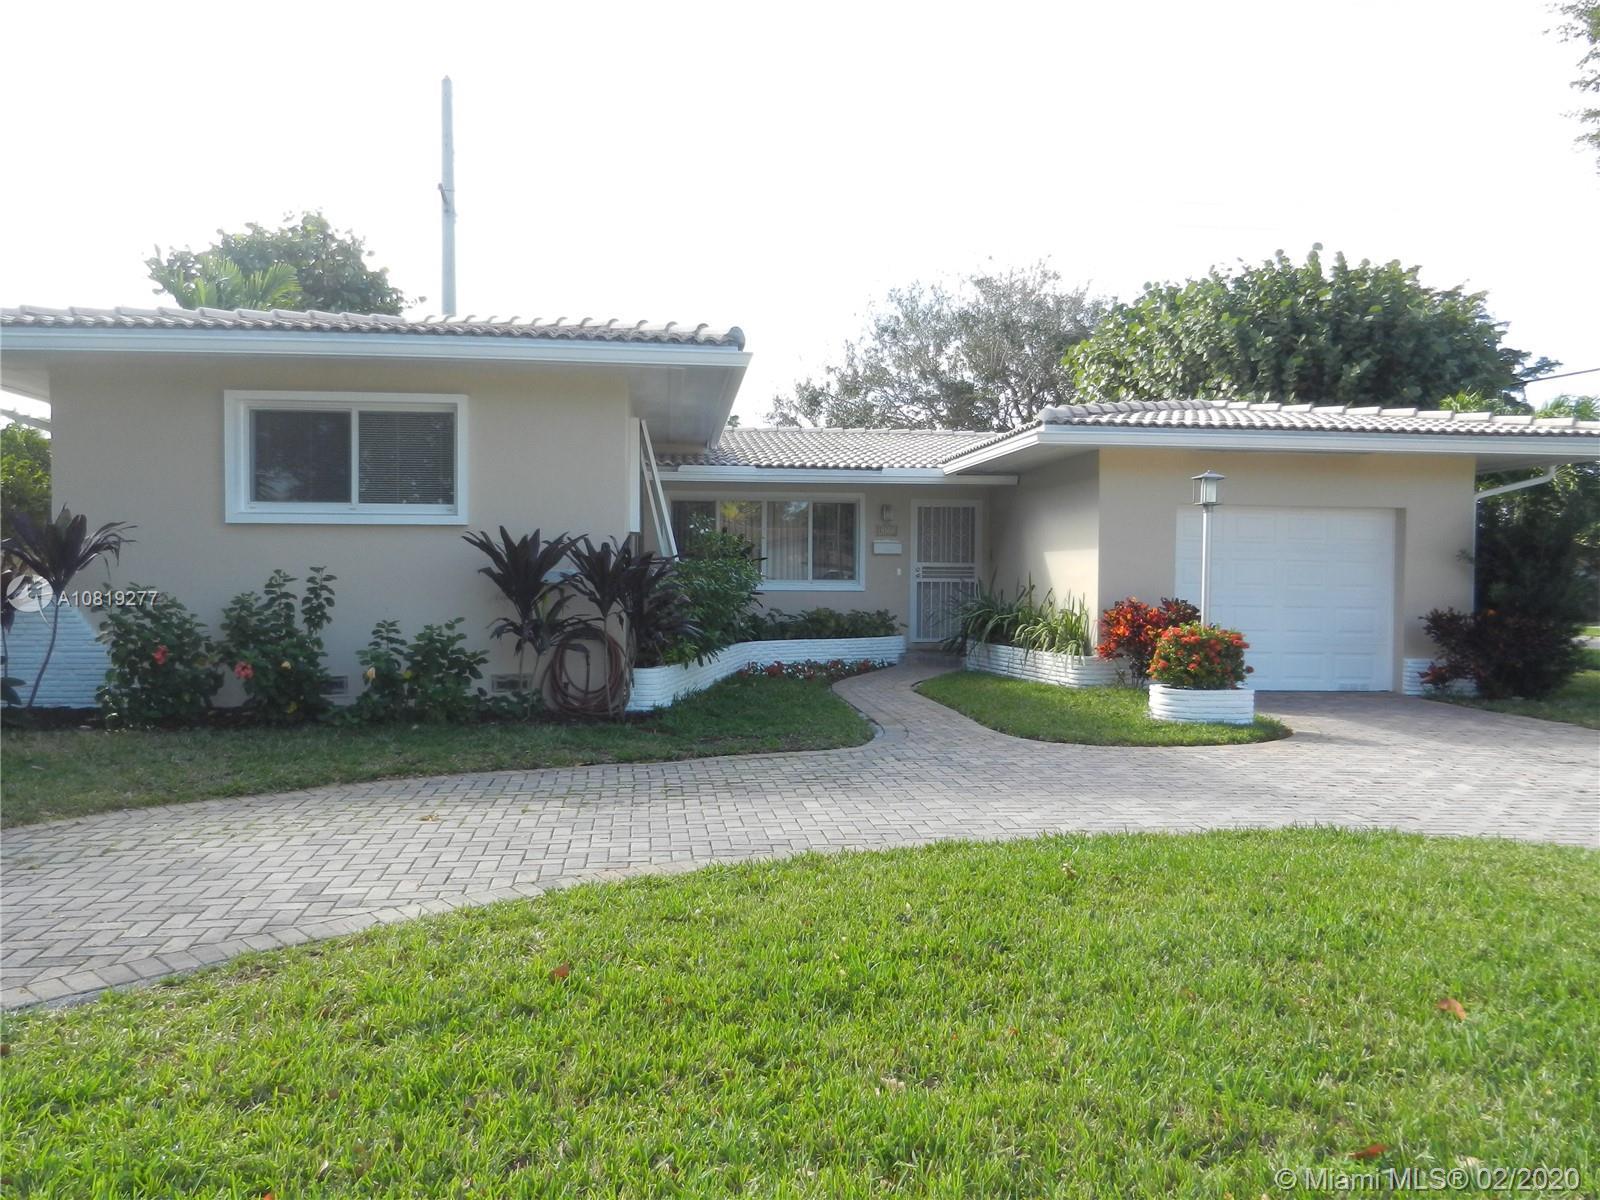 1190  Dove Ave  For Sale A10819277, FL